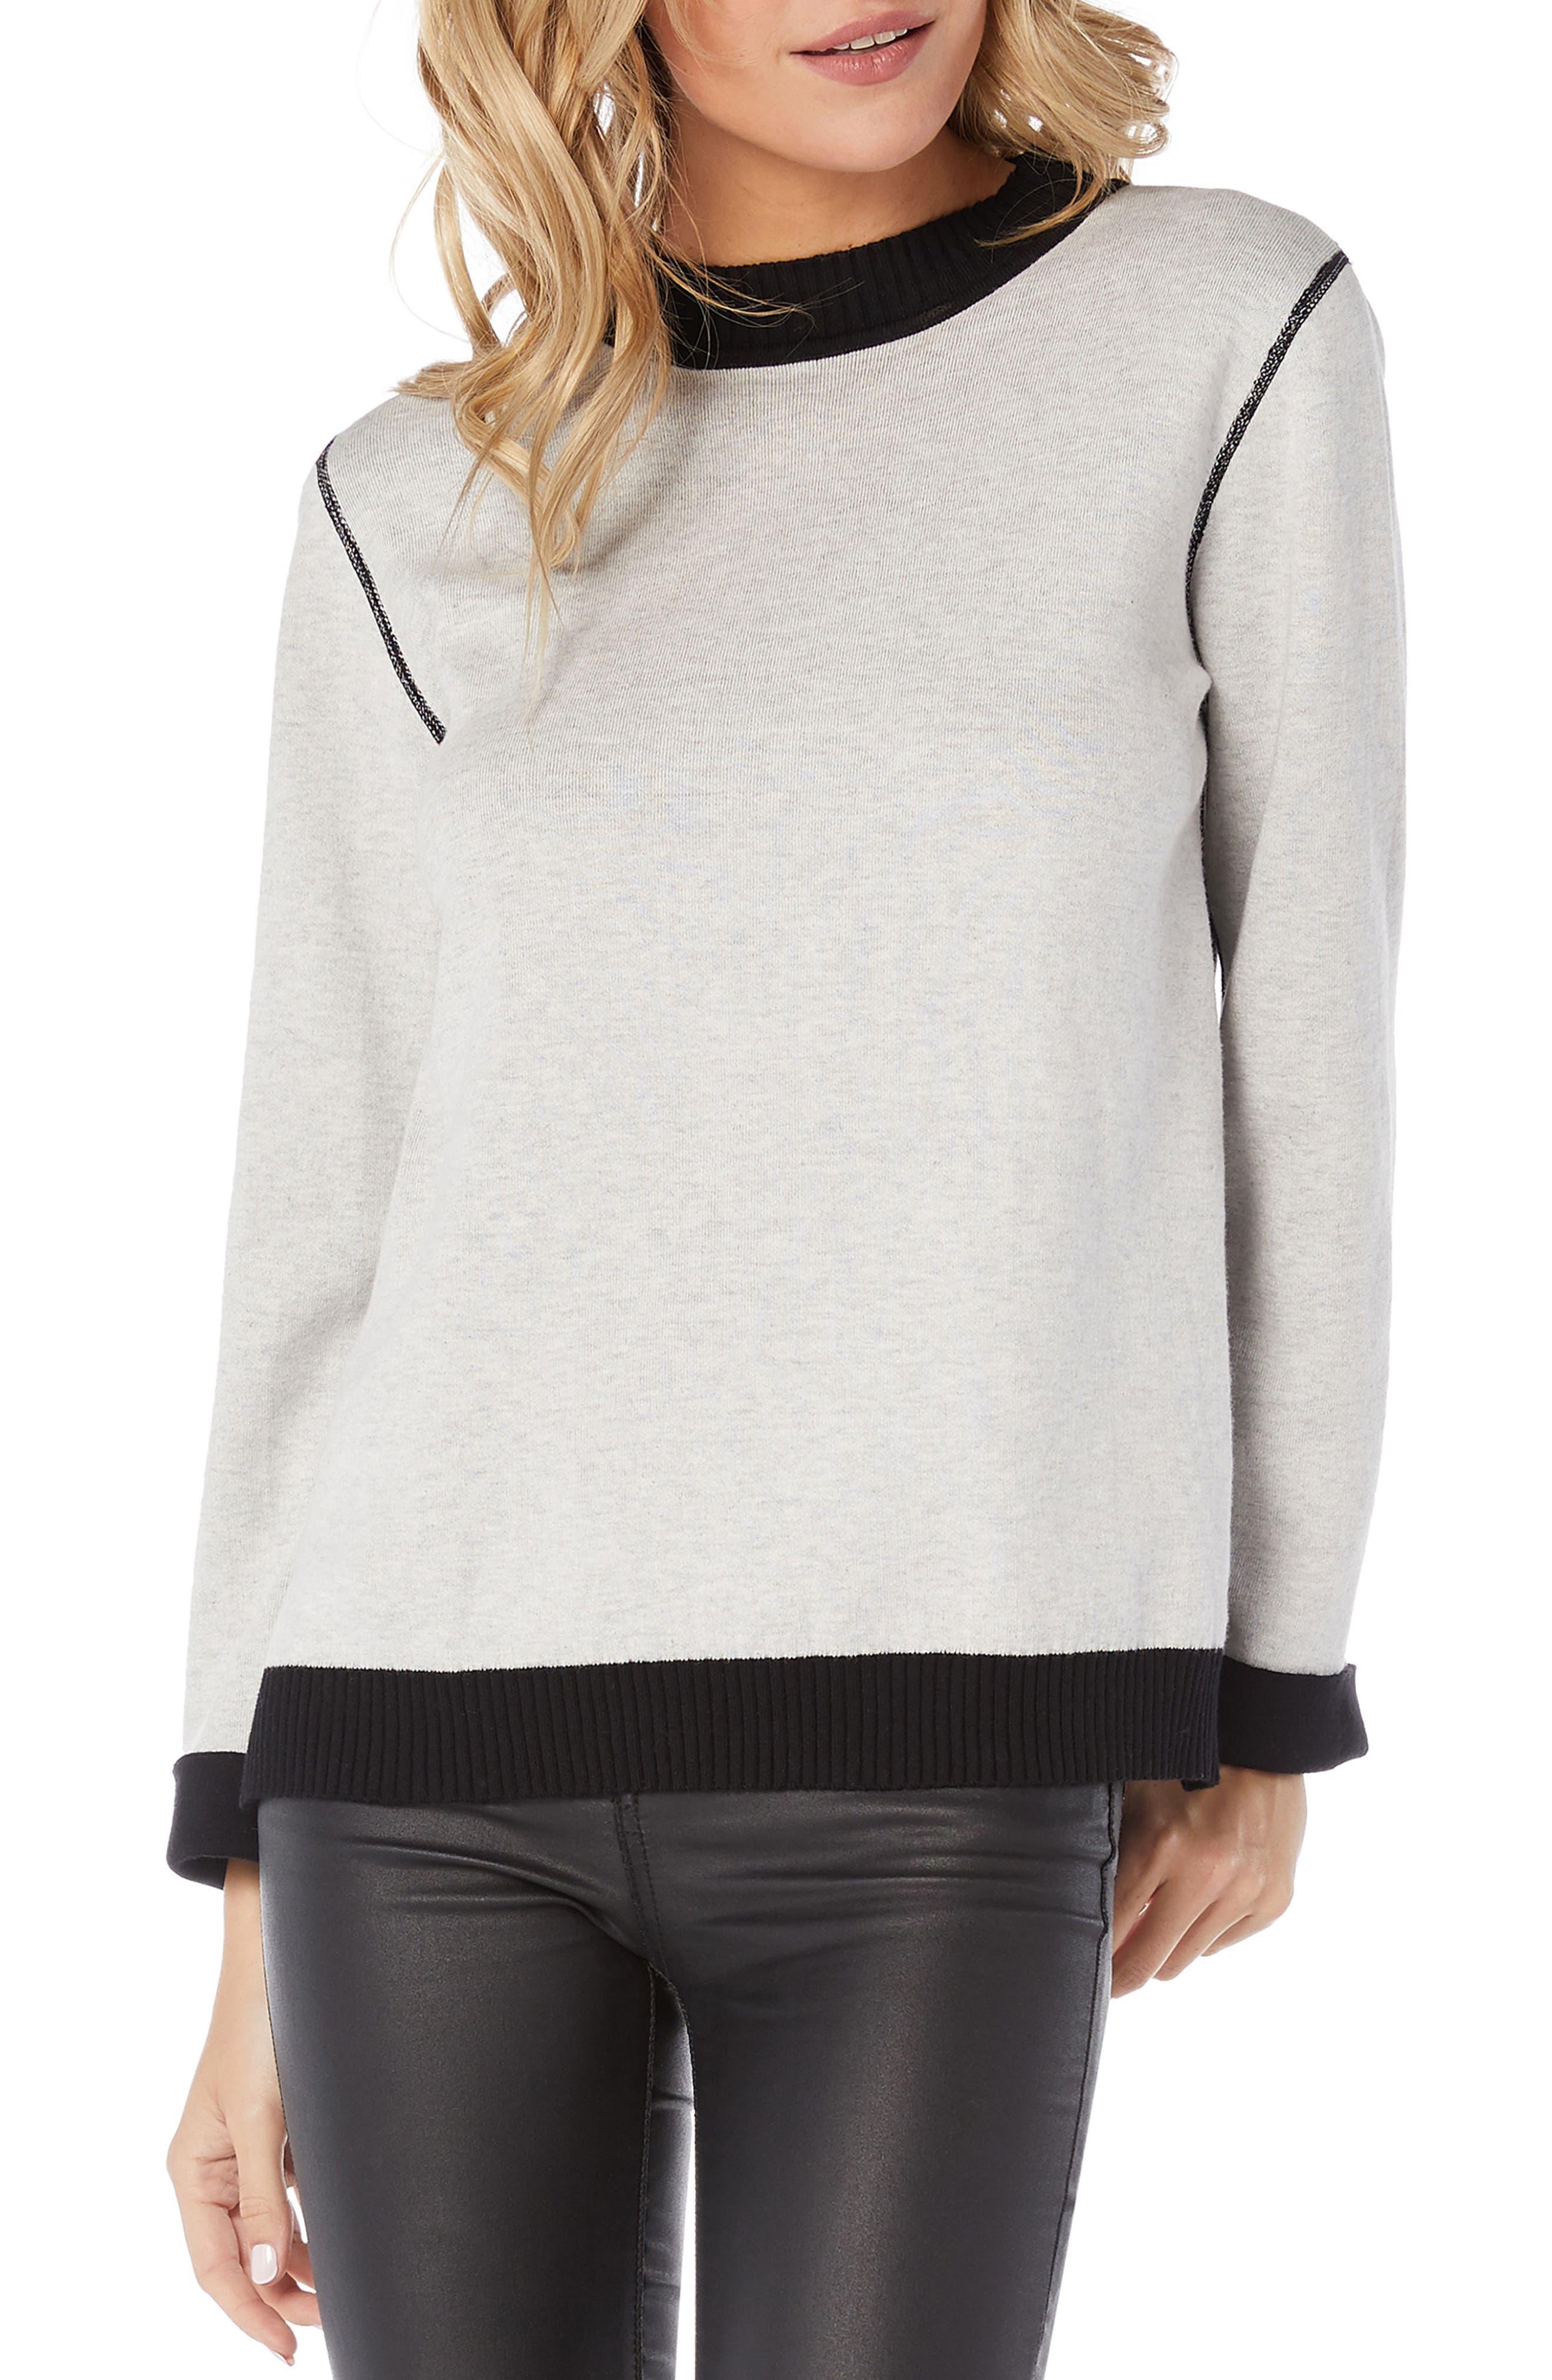 MICHAEL STARS Reversible Sweatshirt in Black/ Chalk